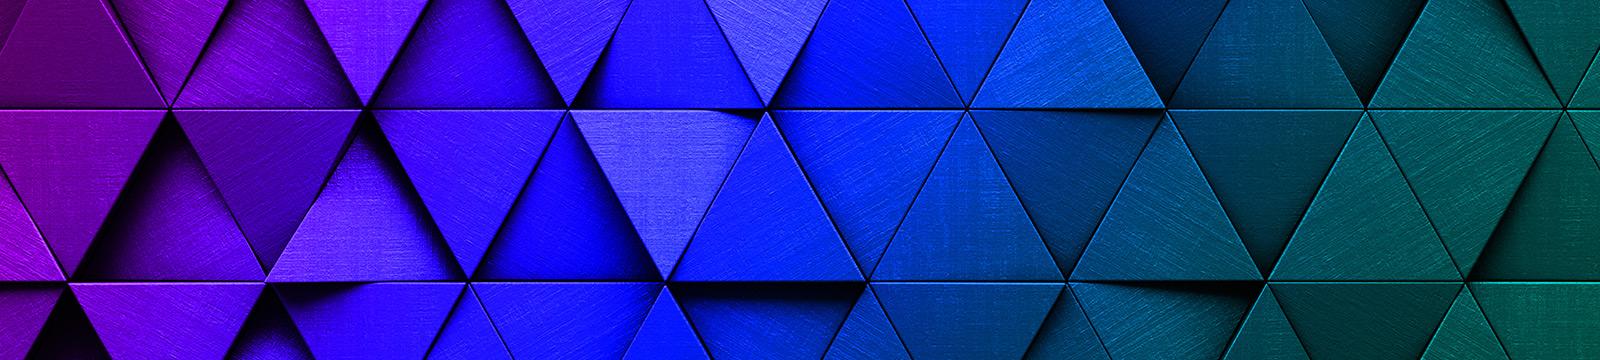 textureur 3d